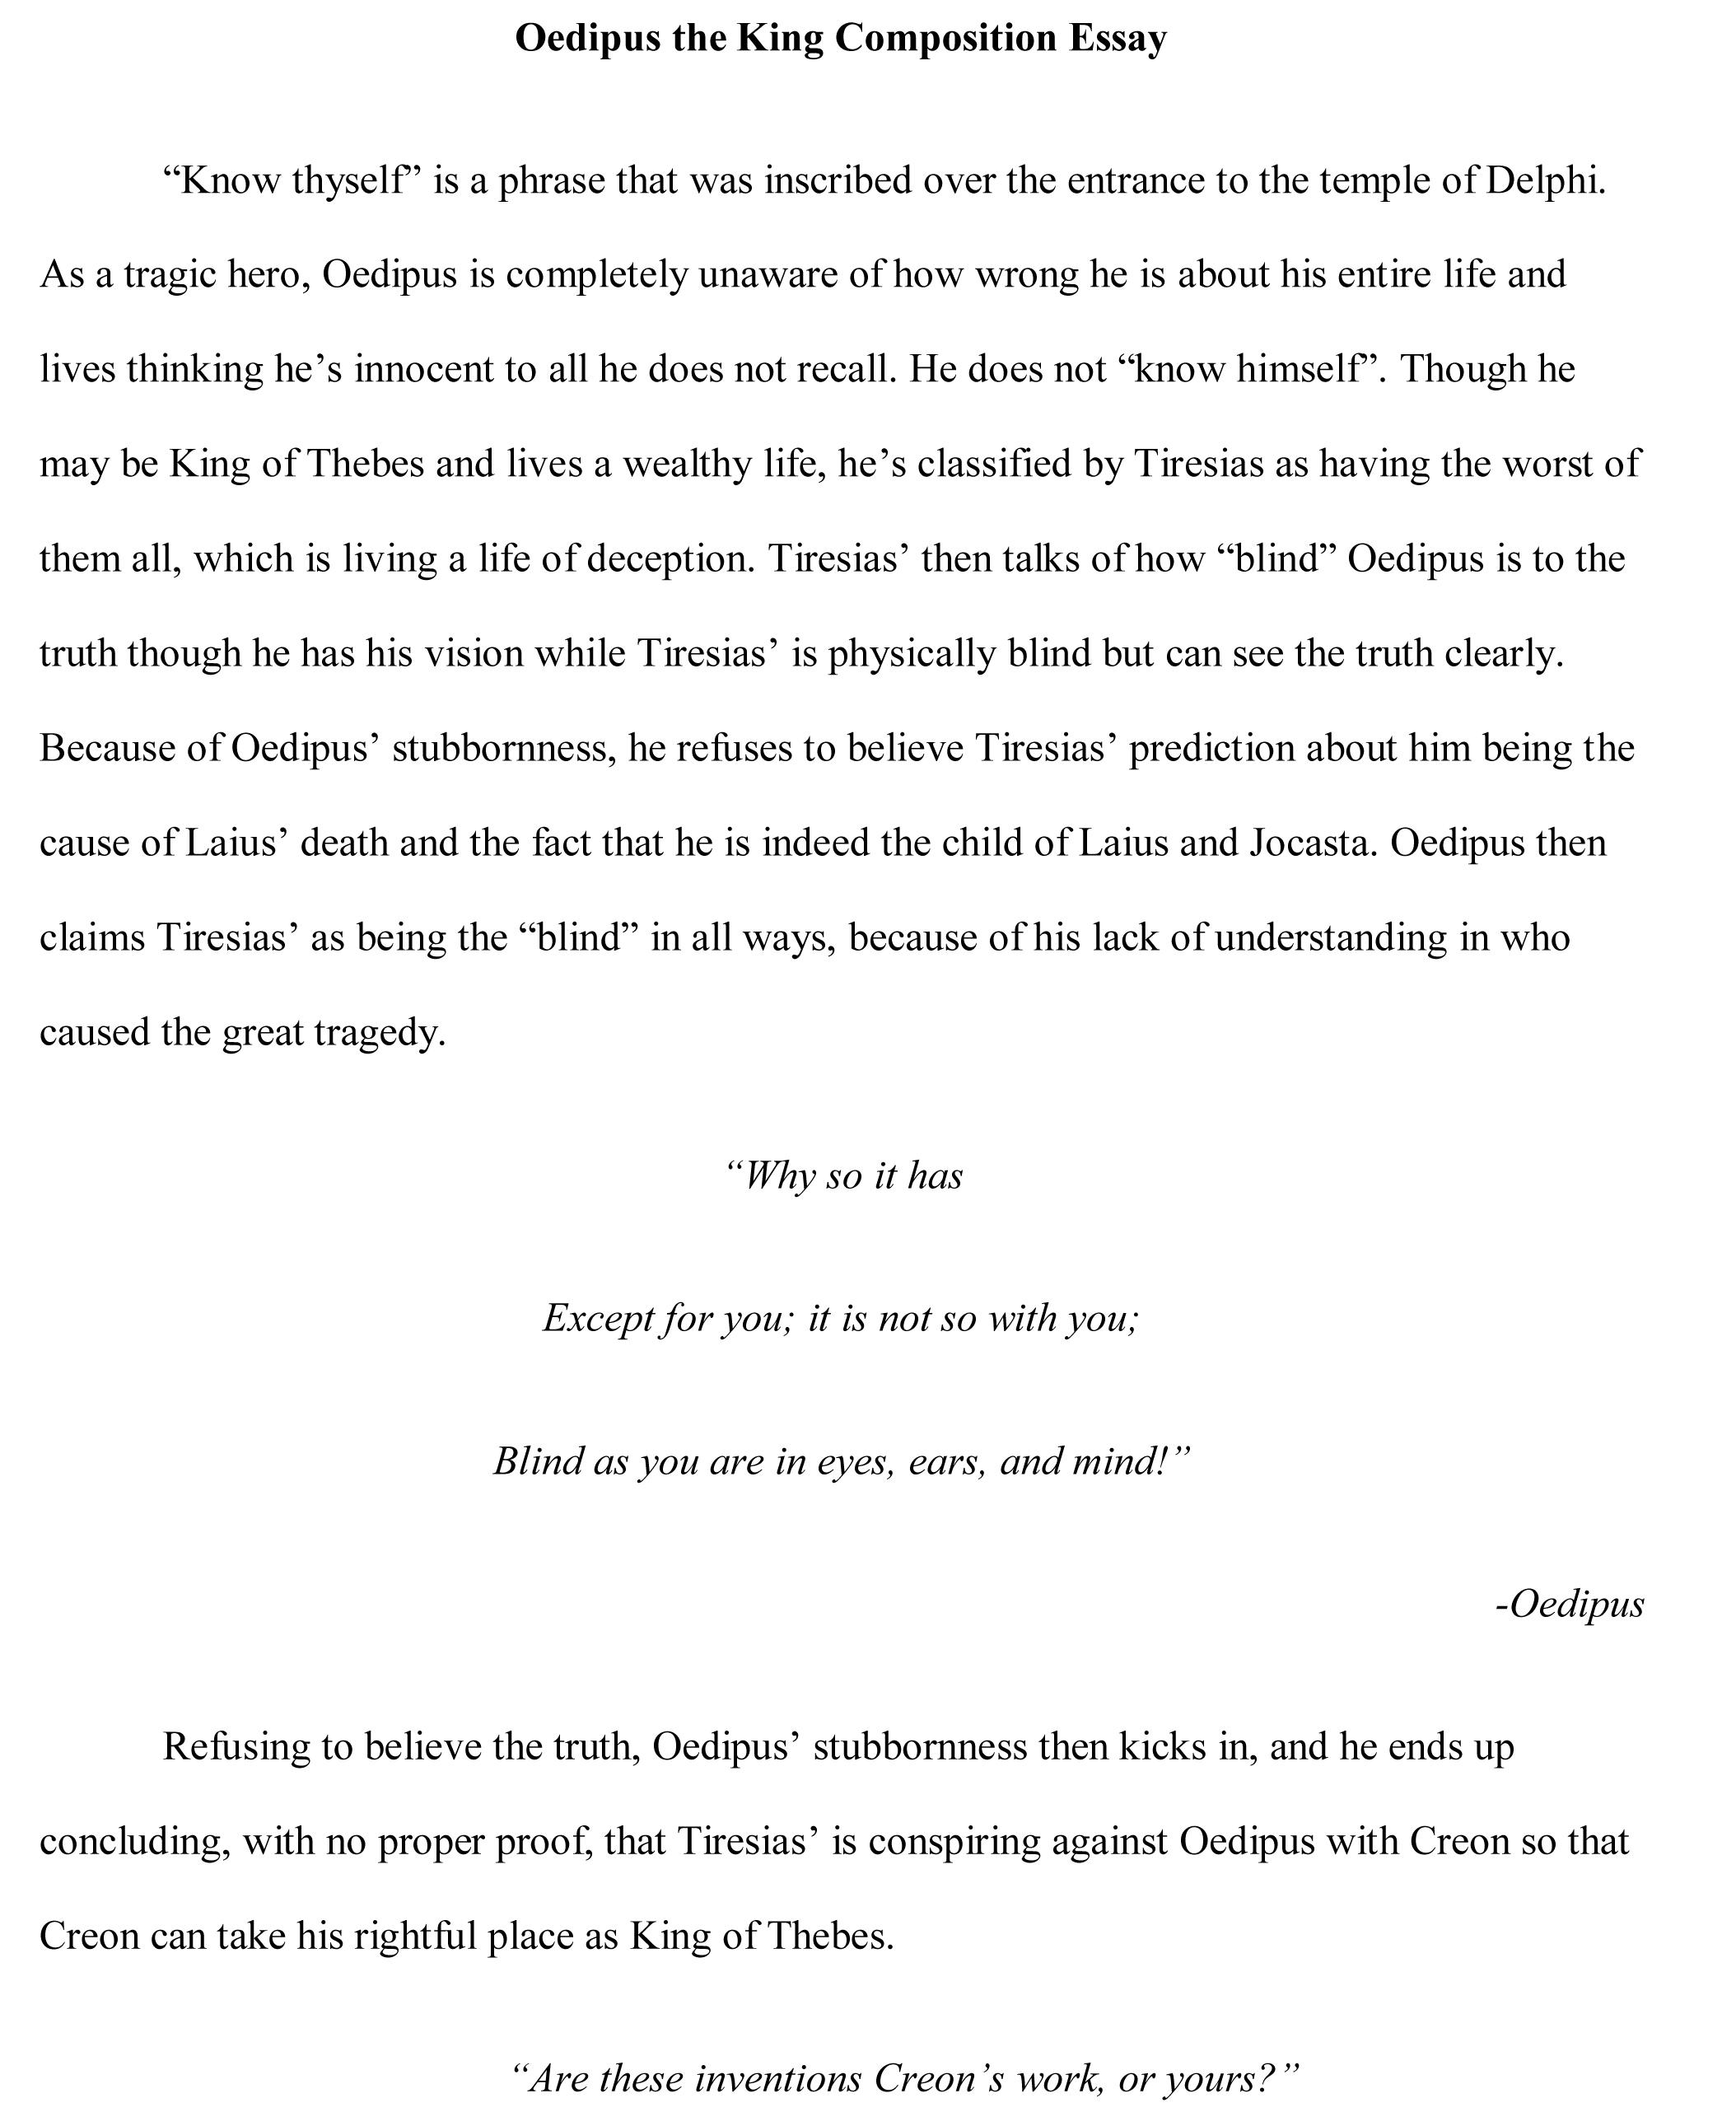 008 Oedipus Essay Free Sample Argumentative Hooks Incredible Hook Examples Pdf Full